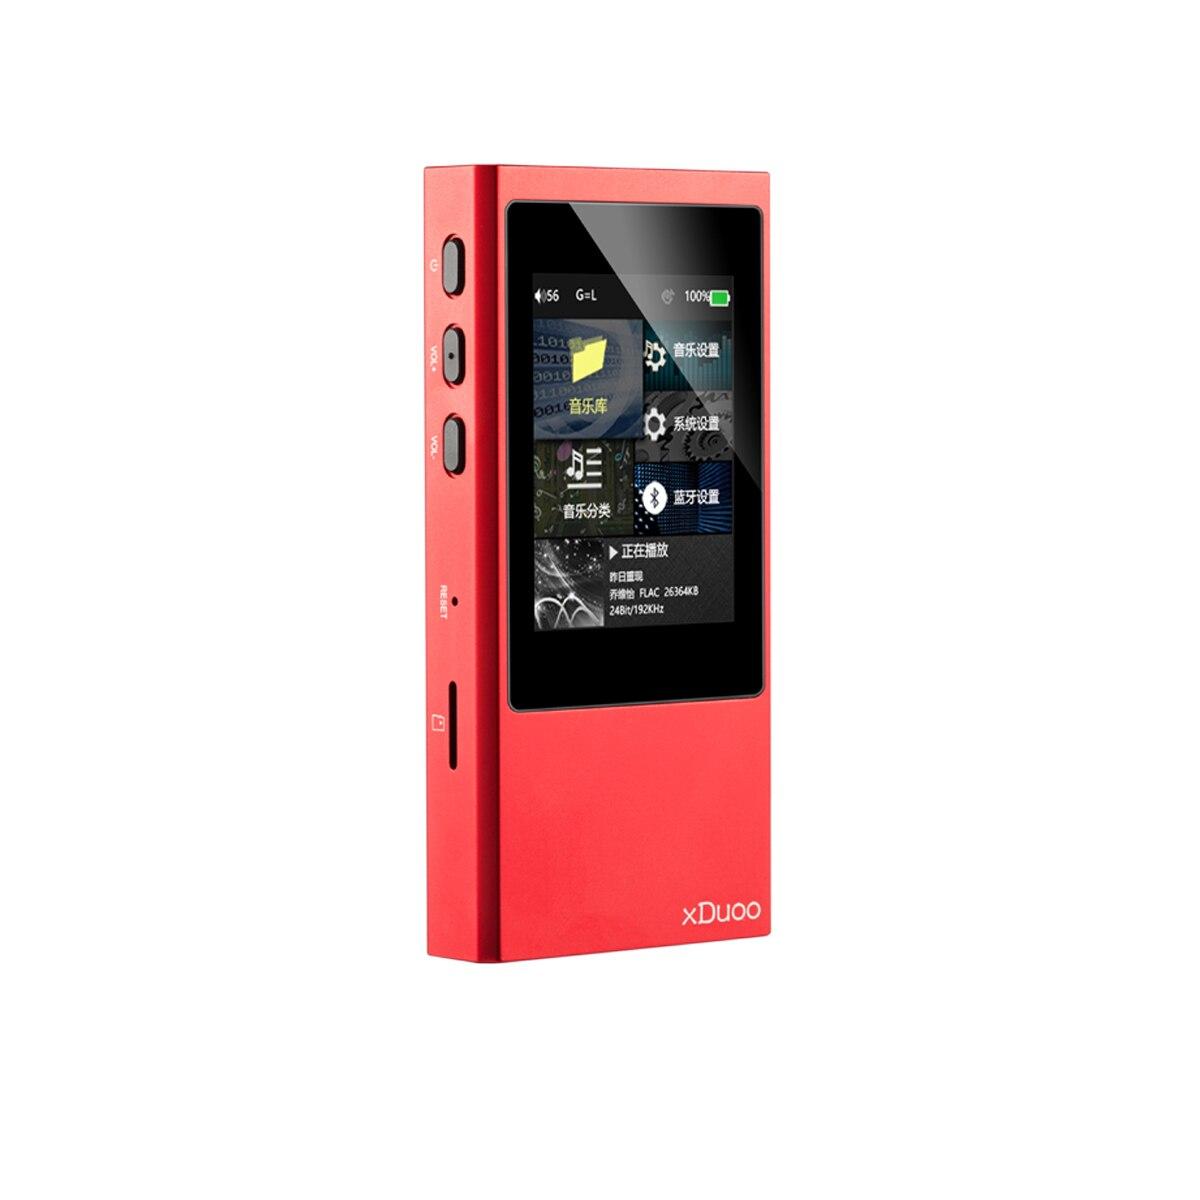 Hifi-geräte Xduoo X20 Bluetooth Mp3 Player Dsd Lossless Hifi Musik Player 256g Unterstützung Bluetooth Amp Pcm384khz/32bit Opa1612 Dac Flac